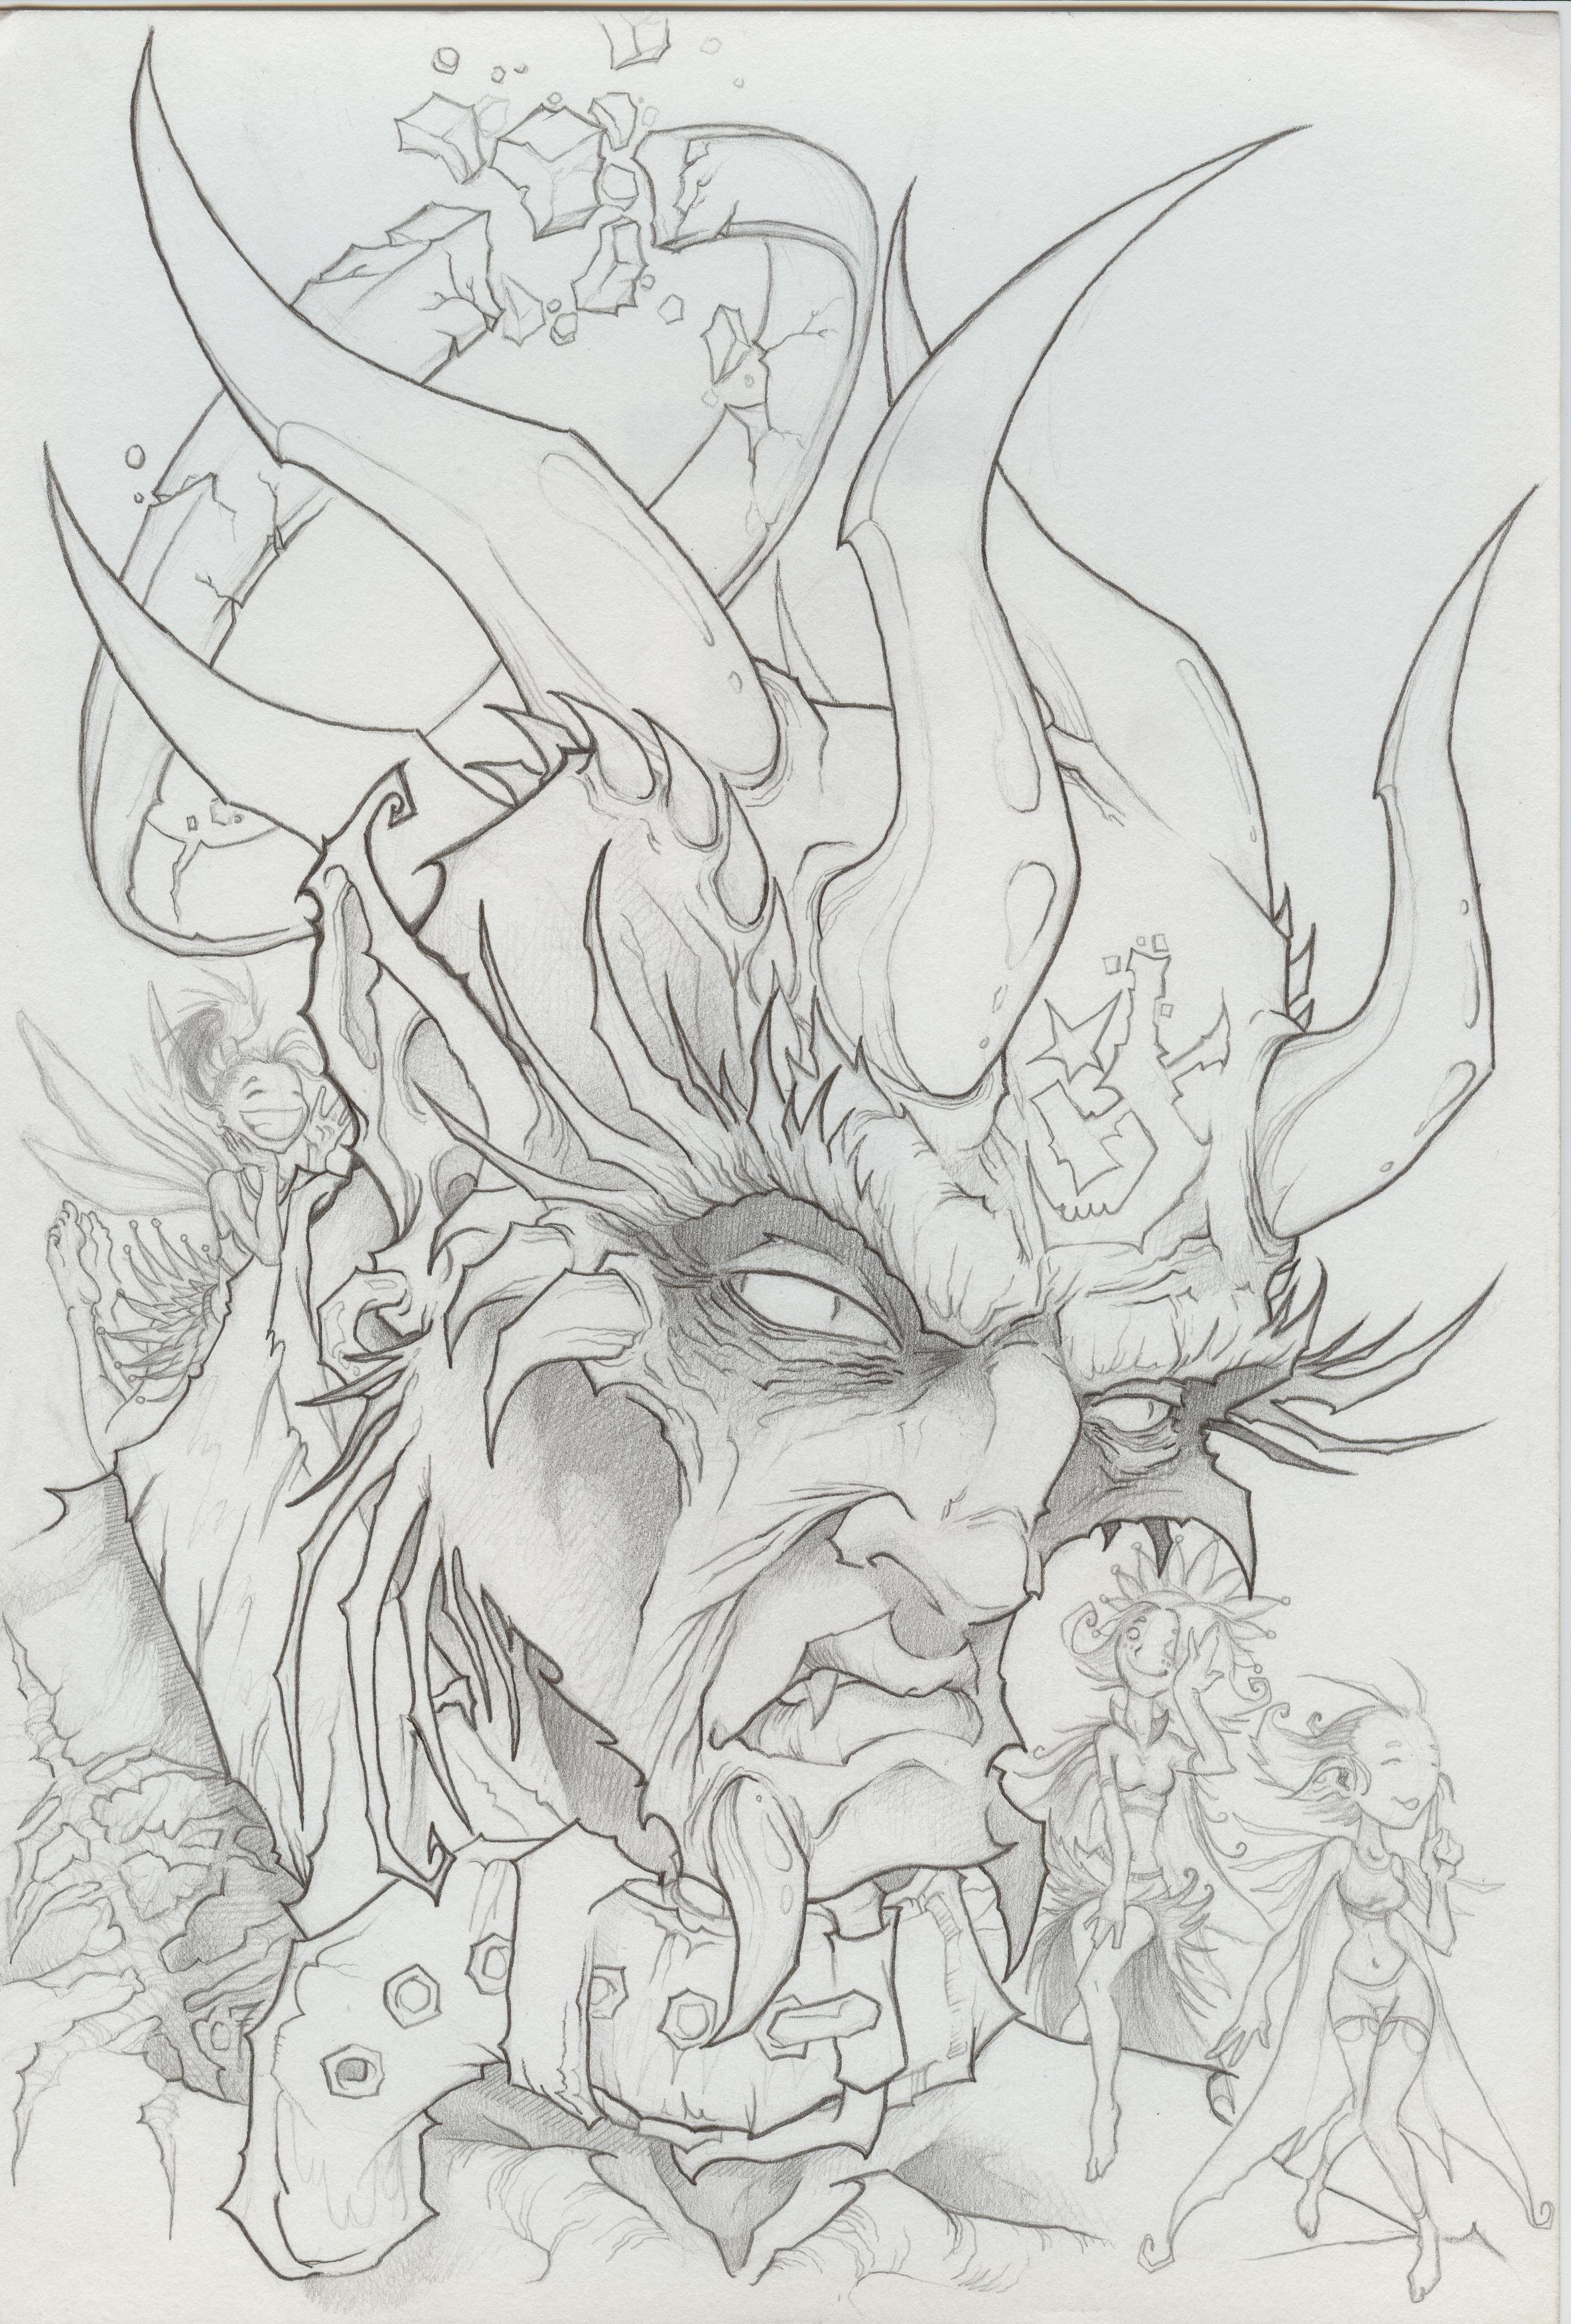 Демоны картинки карандашом, гравюра красиво